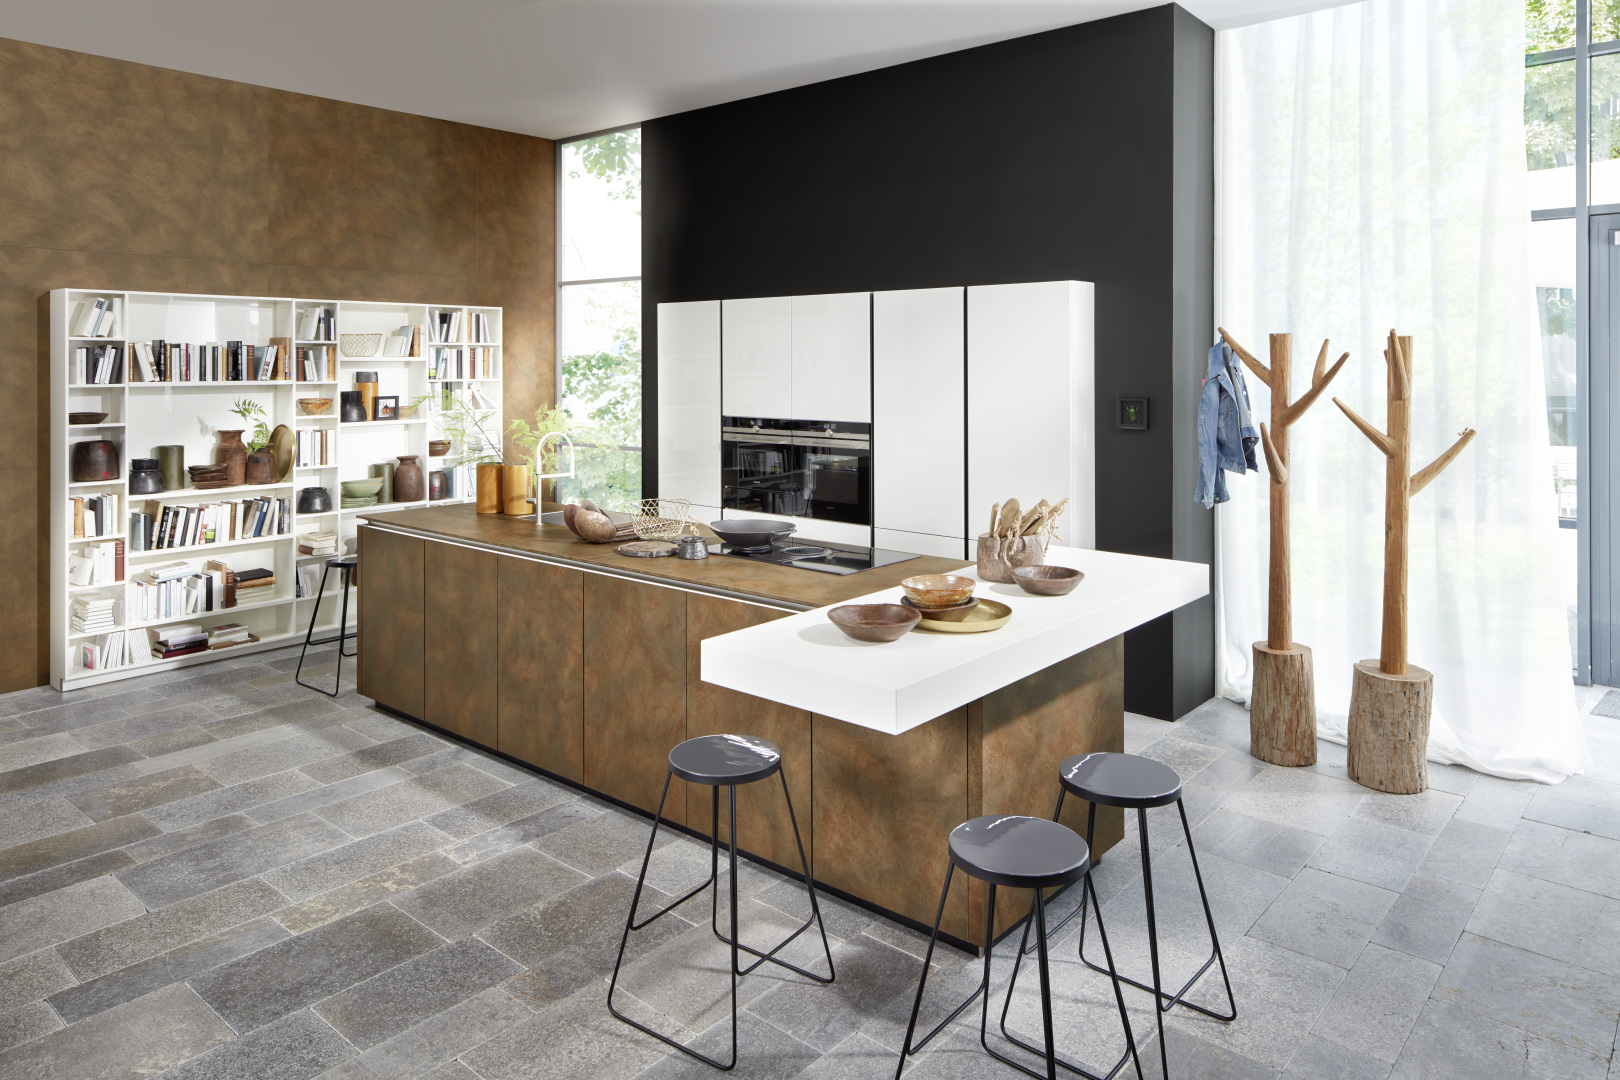 Jolie cuisine moderne installée par cuisiniste annecy littoz